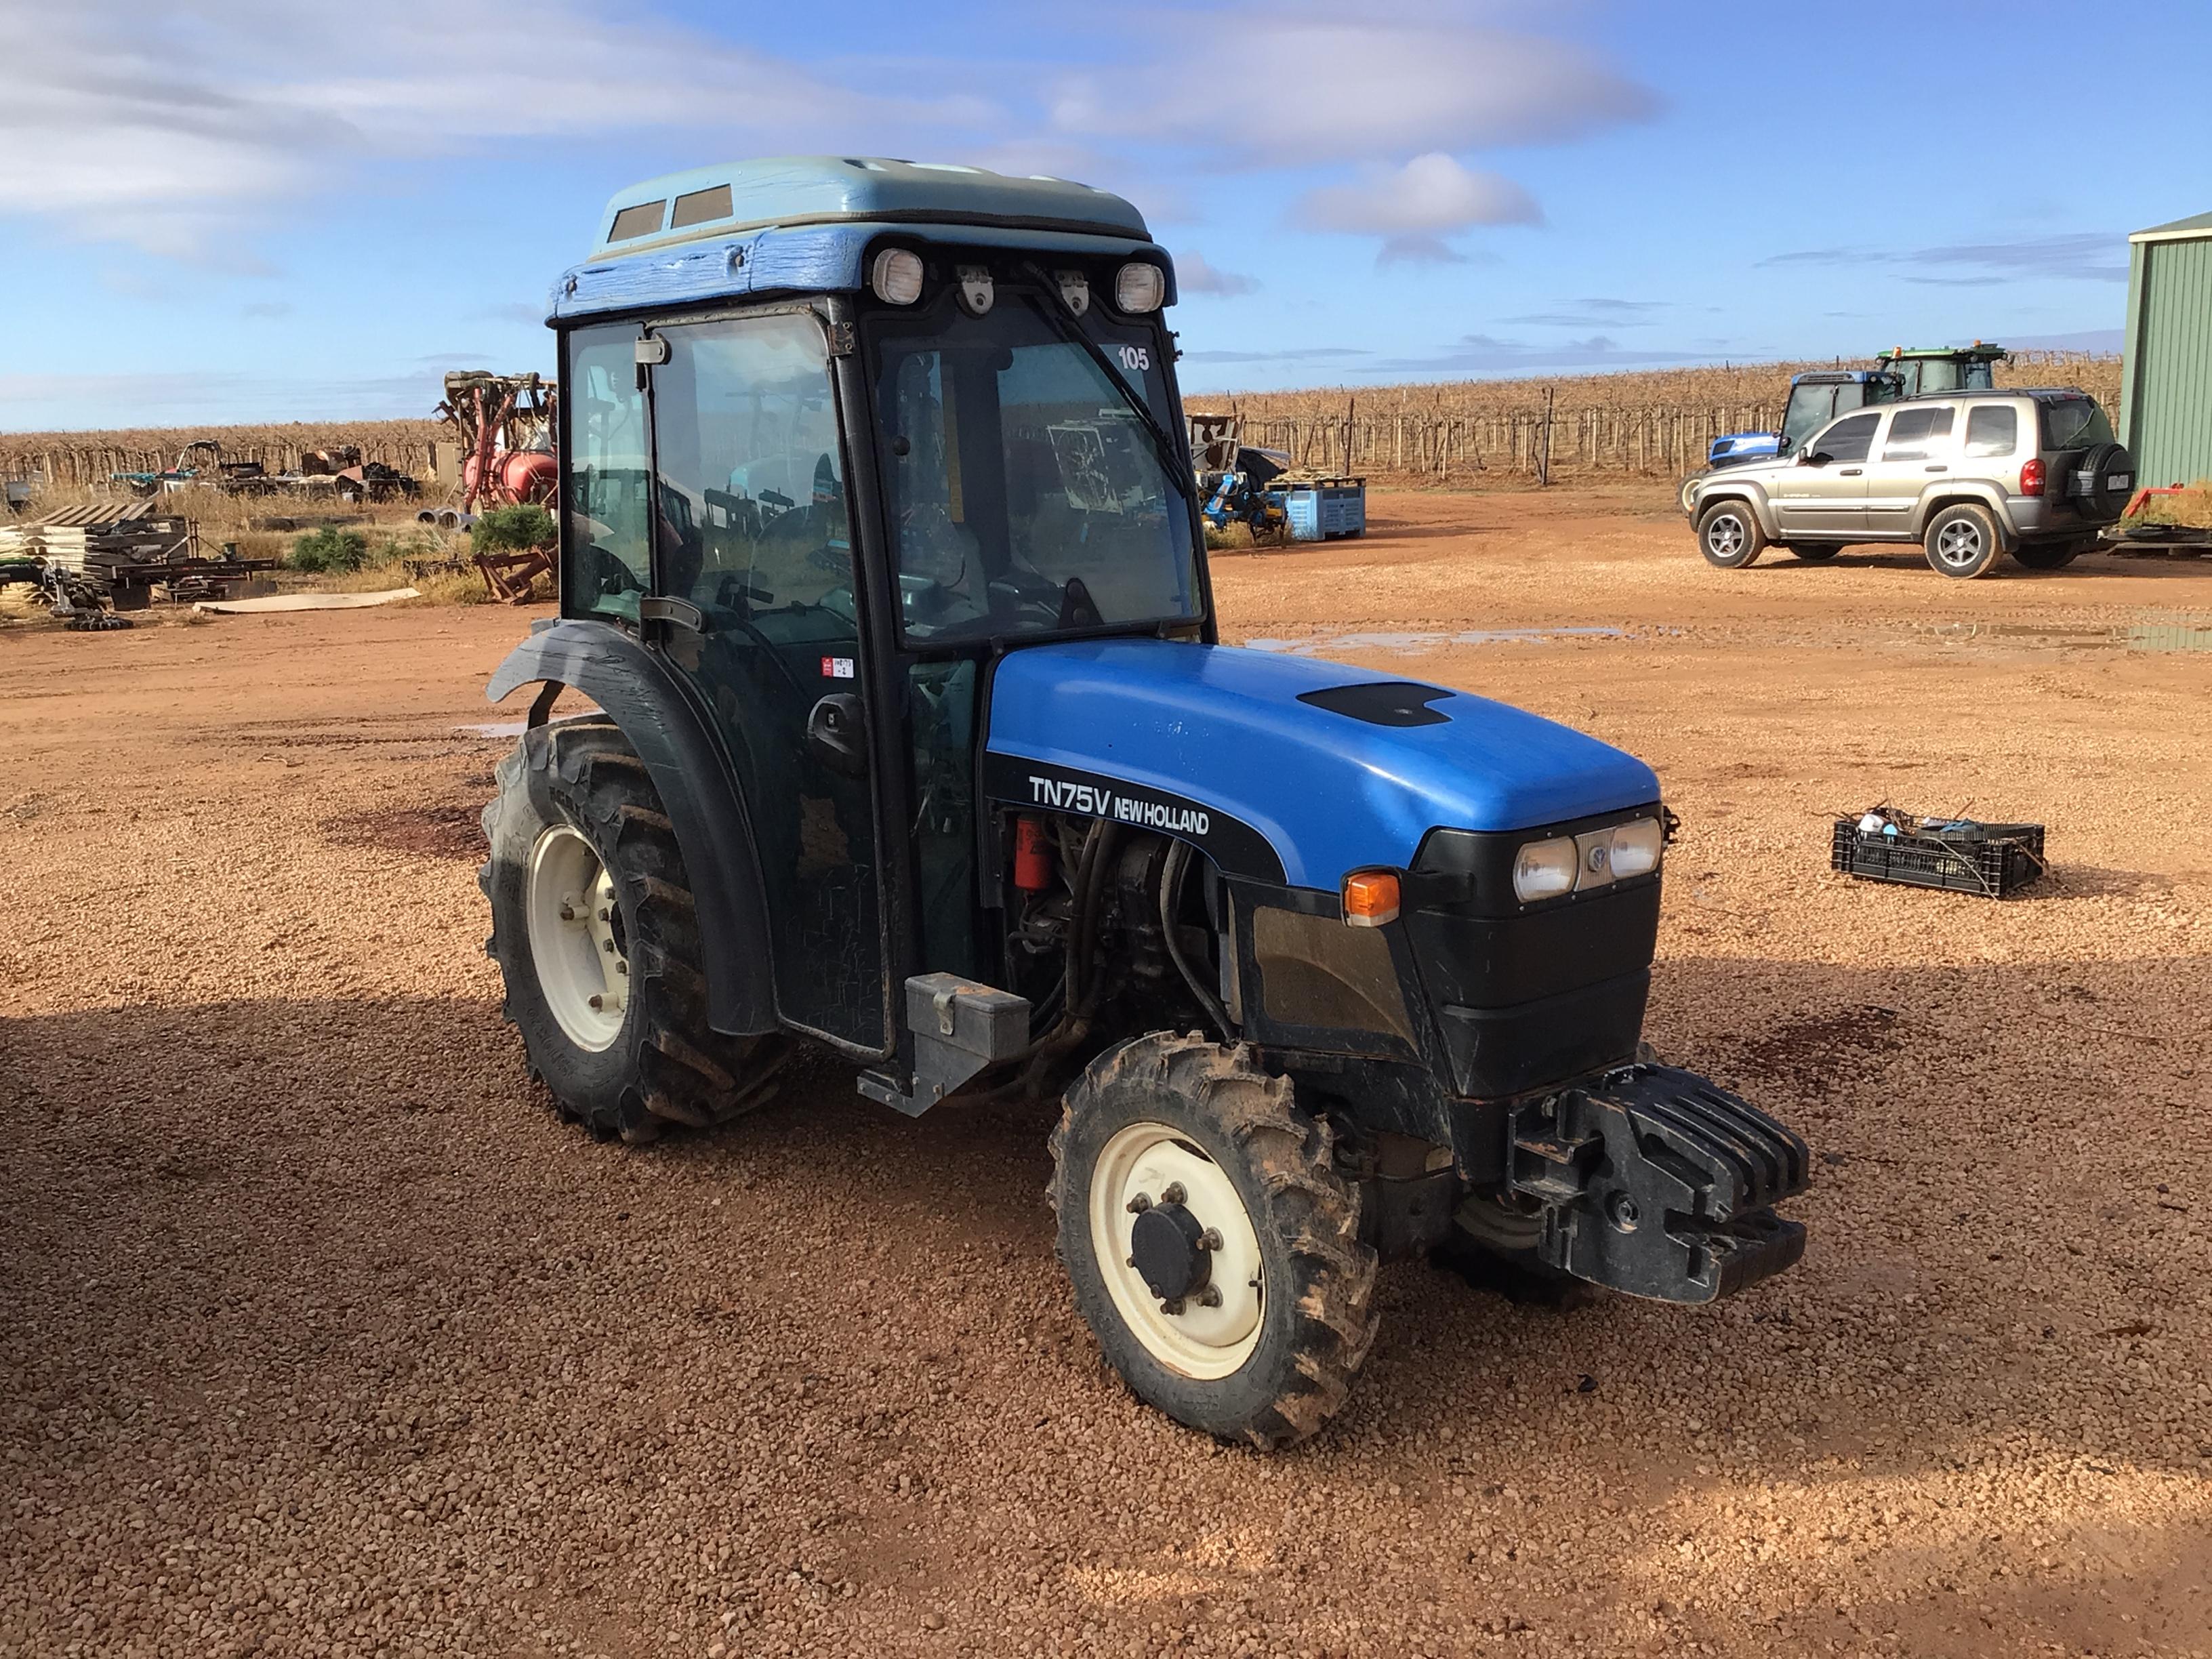 New Holland TN75V Tractor